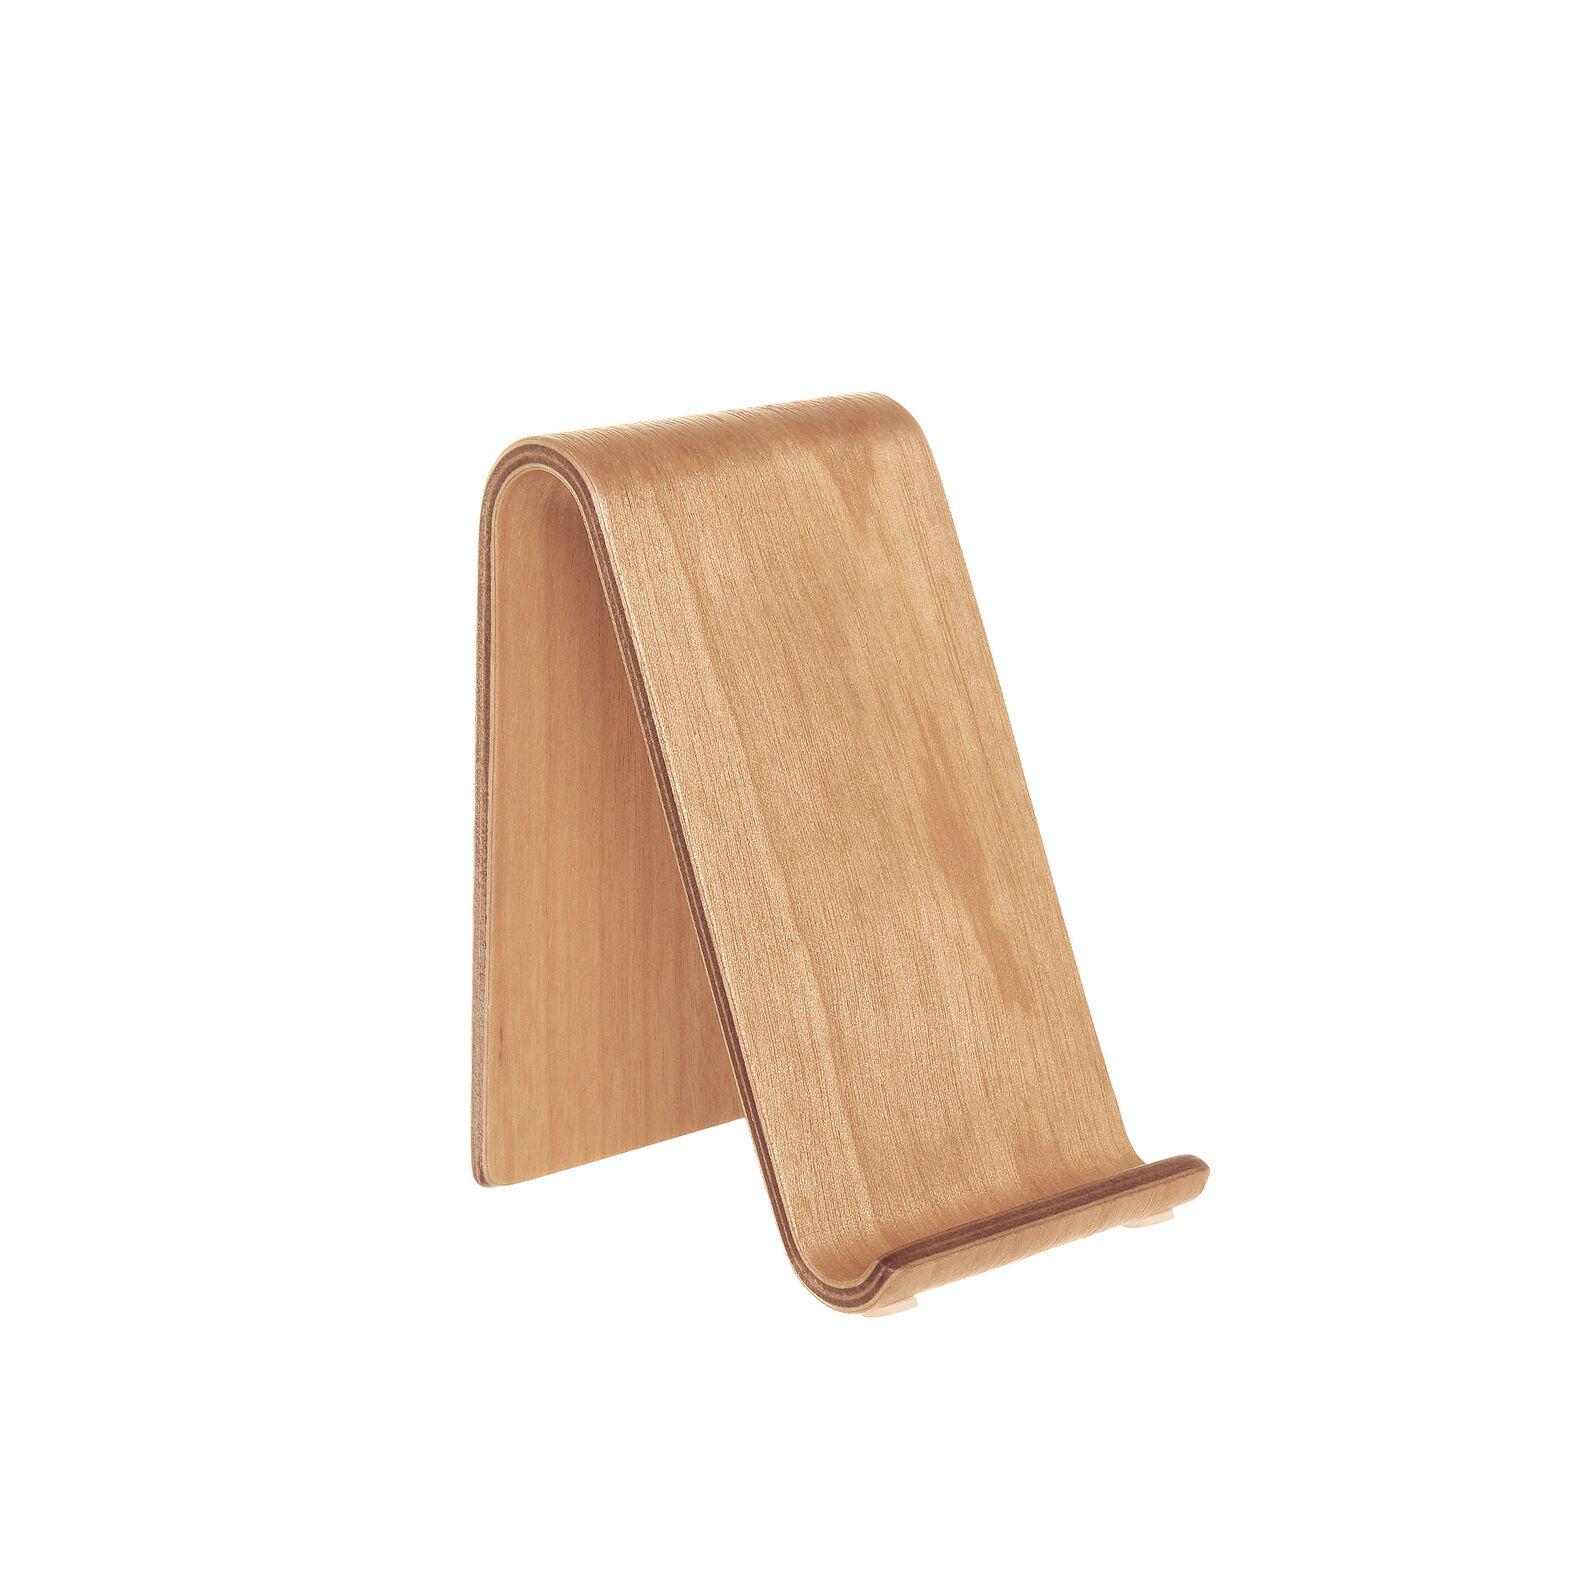 Vertical mobile phone in birch wood